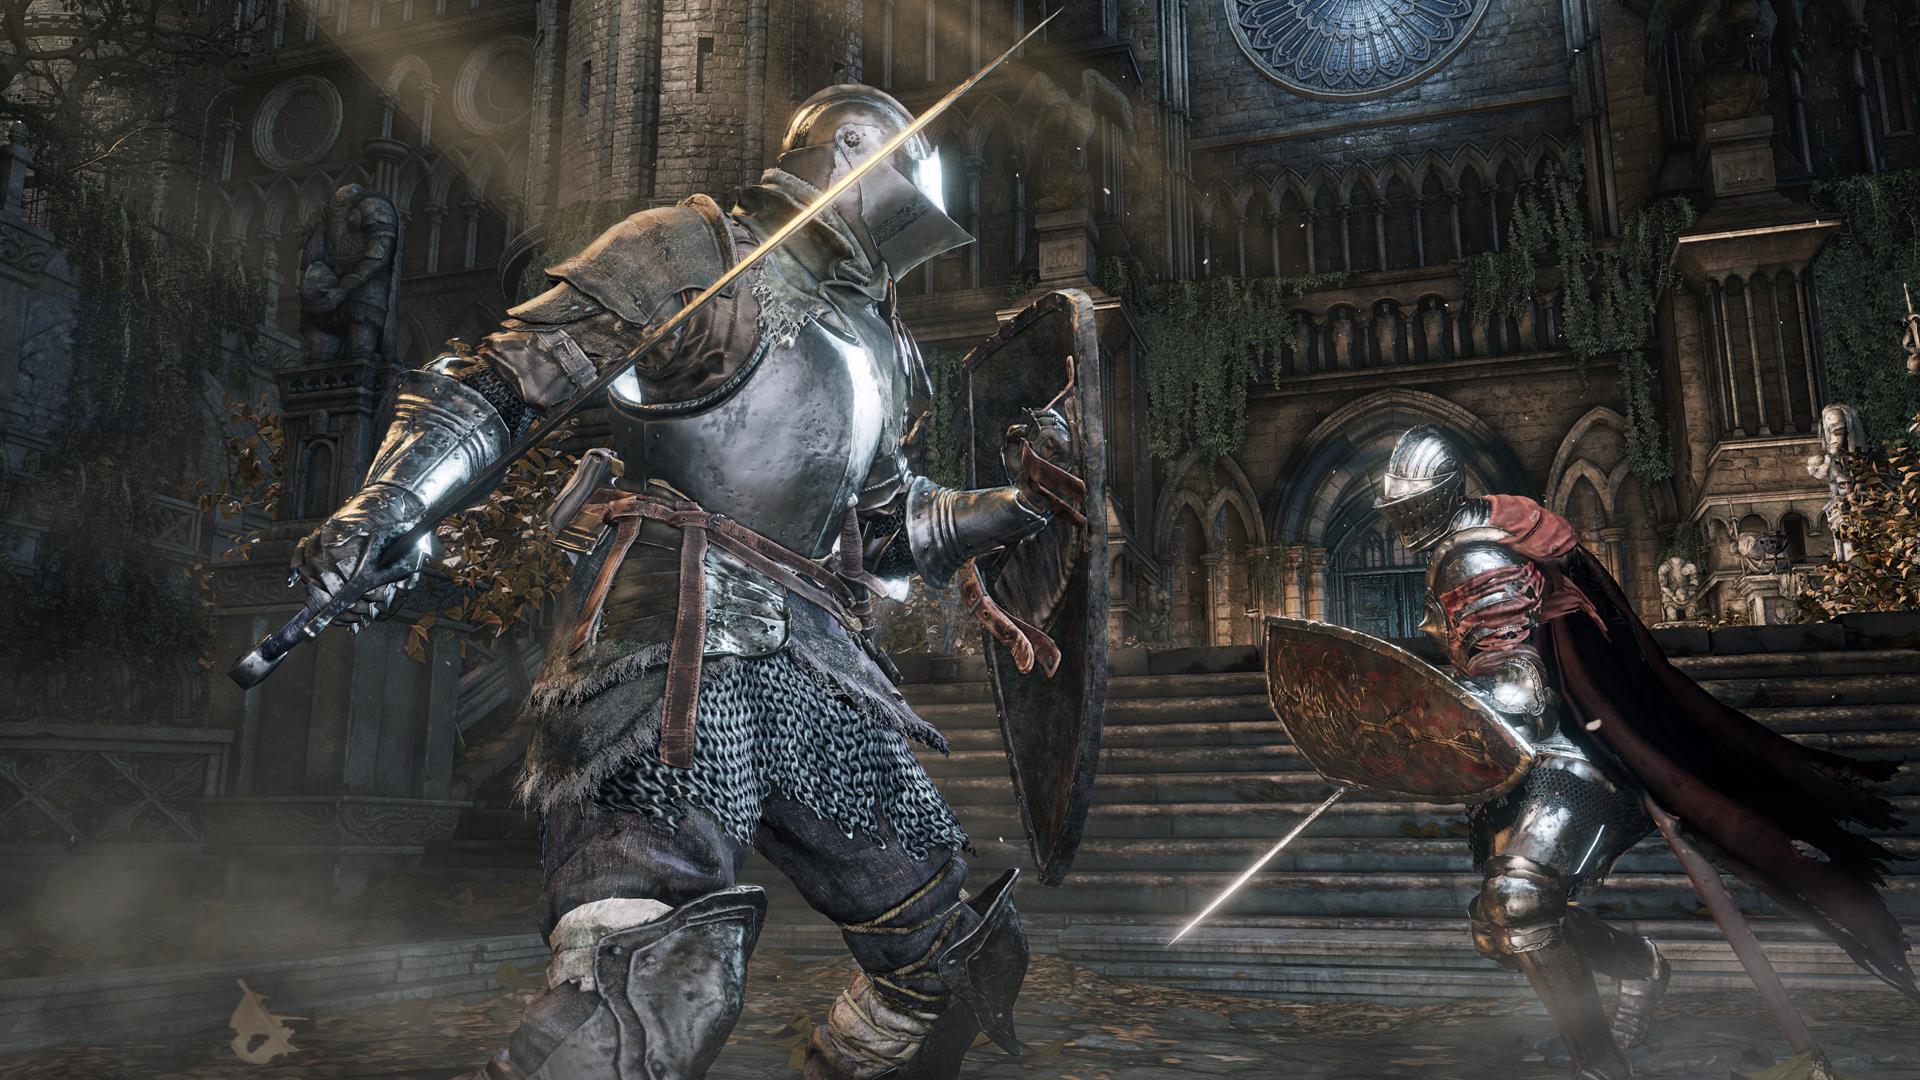 New Dark Souls 3 screens show co-op, spells, miracles ...